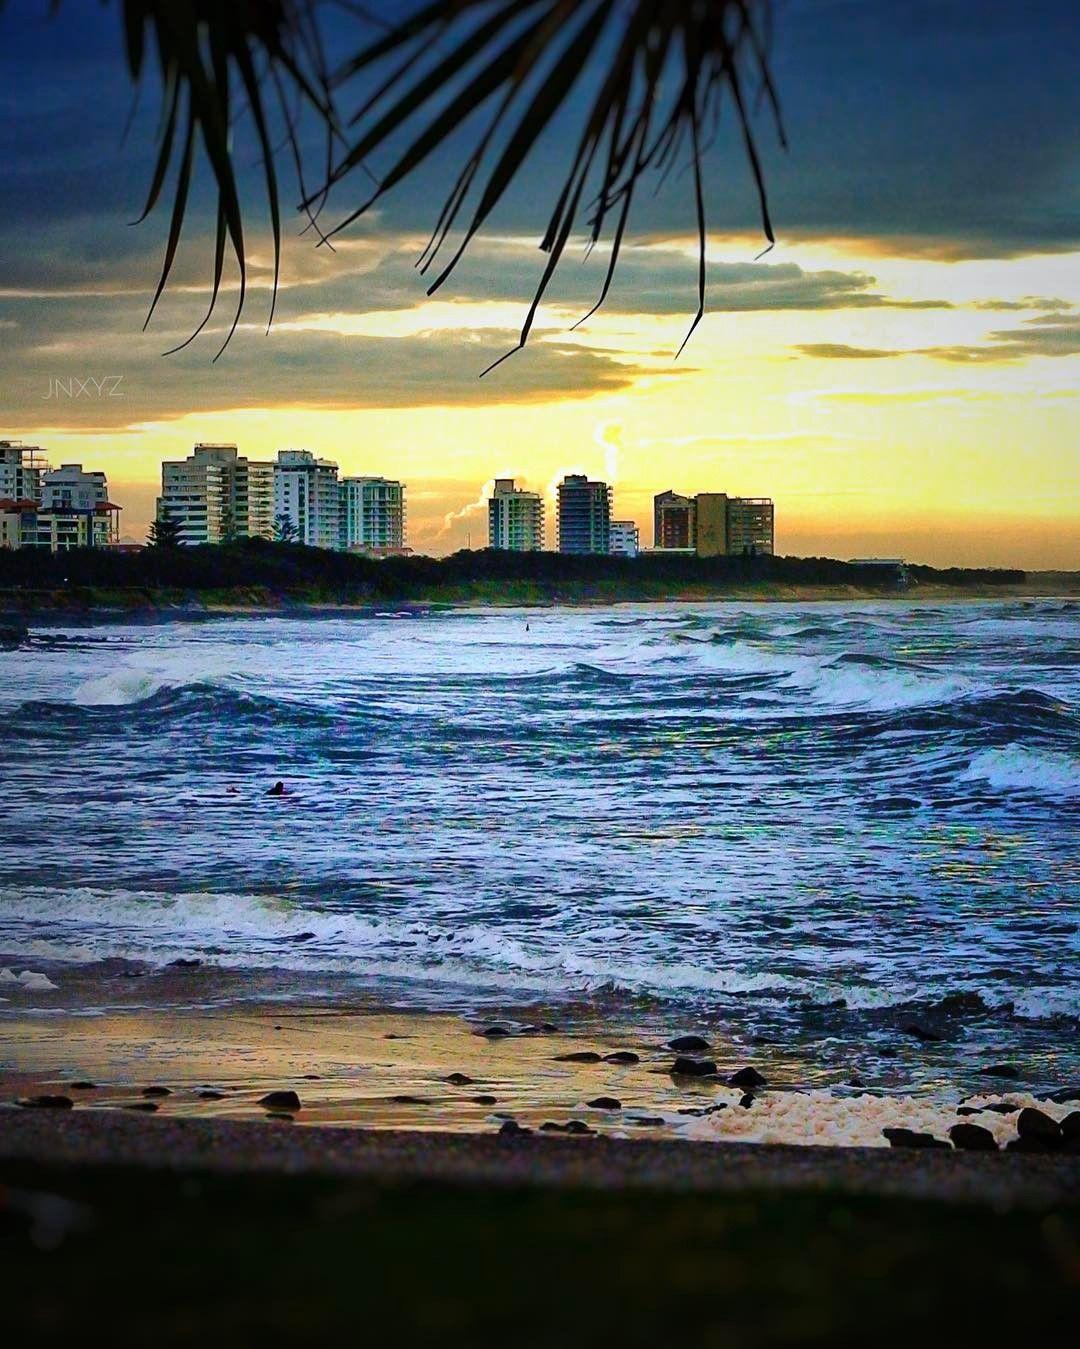 Wandering the shores of Sunshine Coast that evening... . #Beach #sunset #vision #mooloolaba